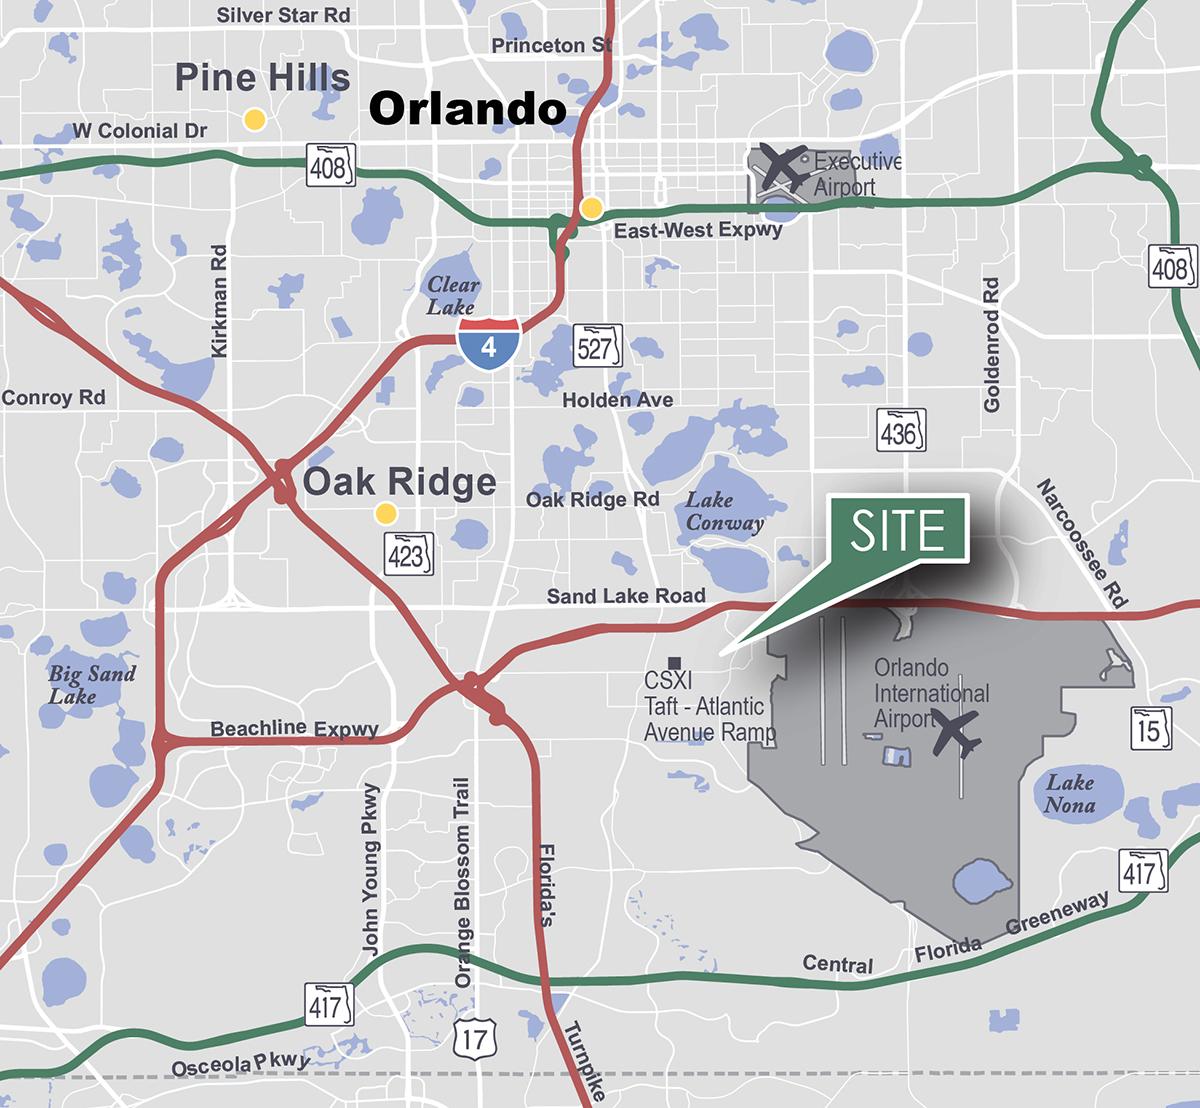 Prologis-Airport-DC_Boggy-Creek-Rd-E-Landstreet-Rd_Map.jpg